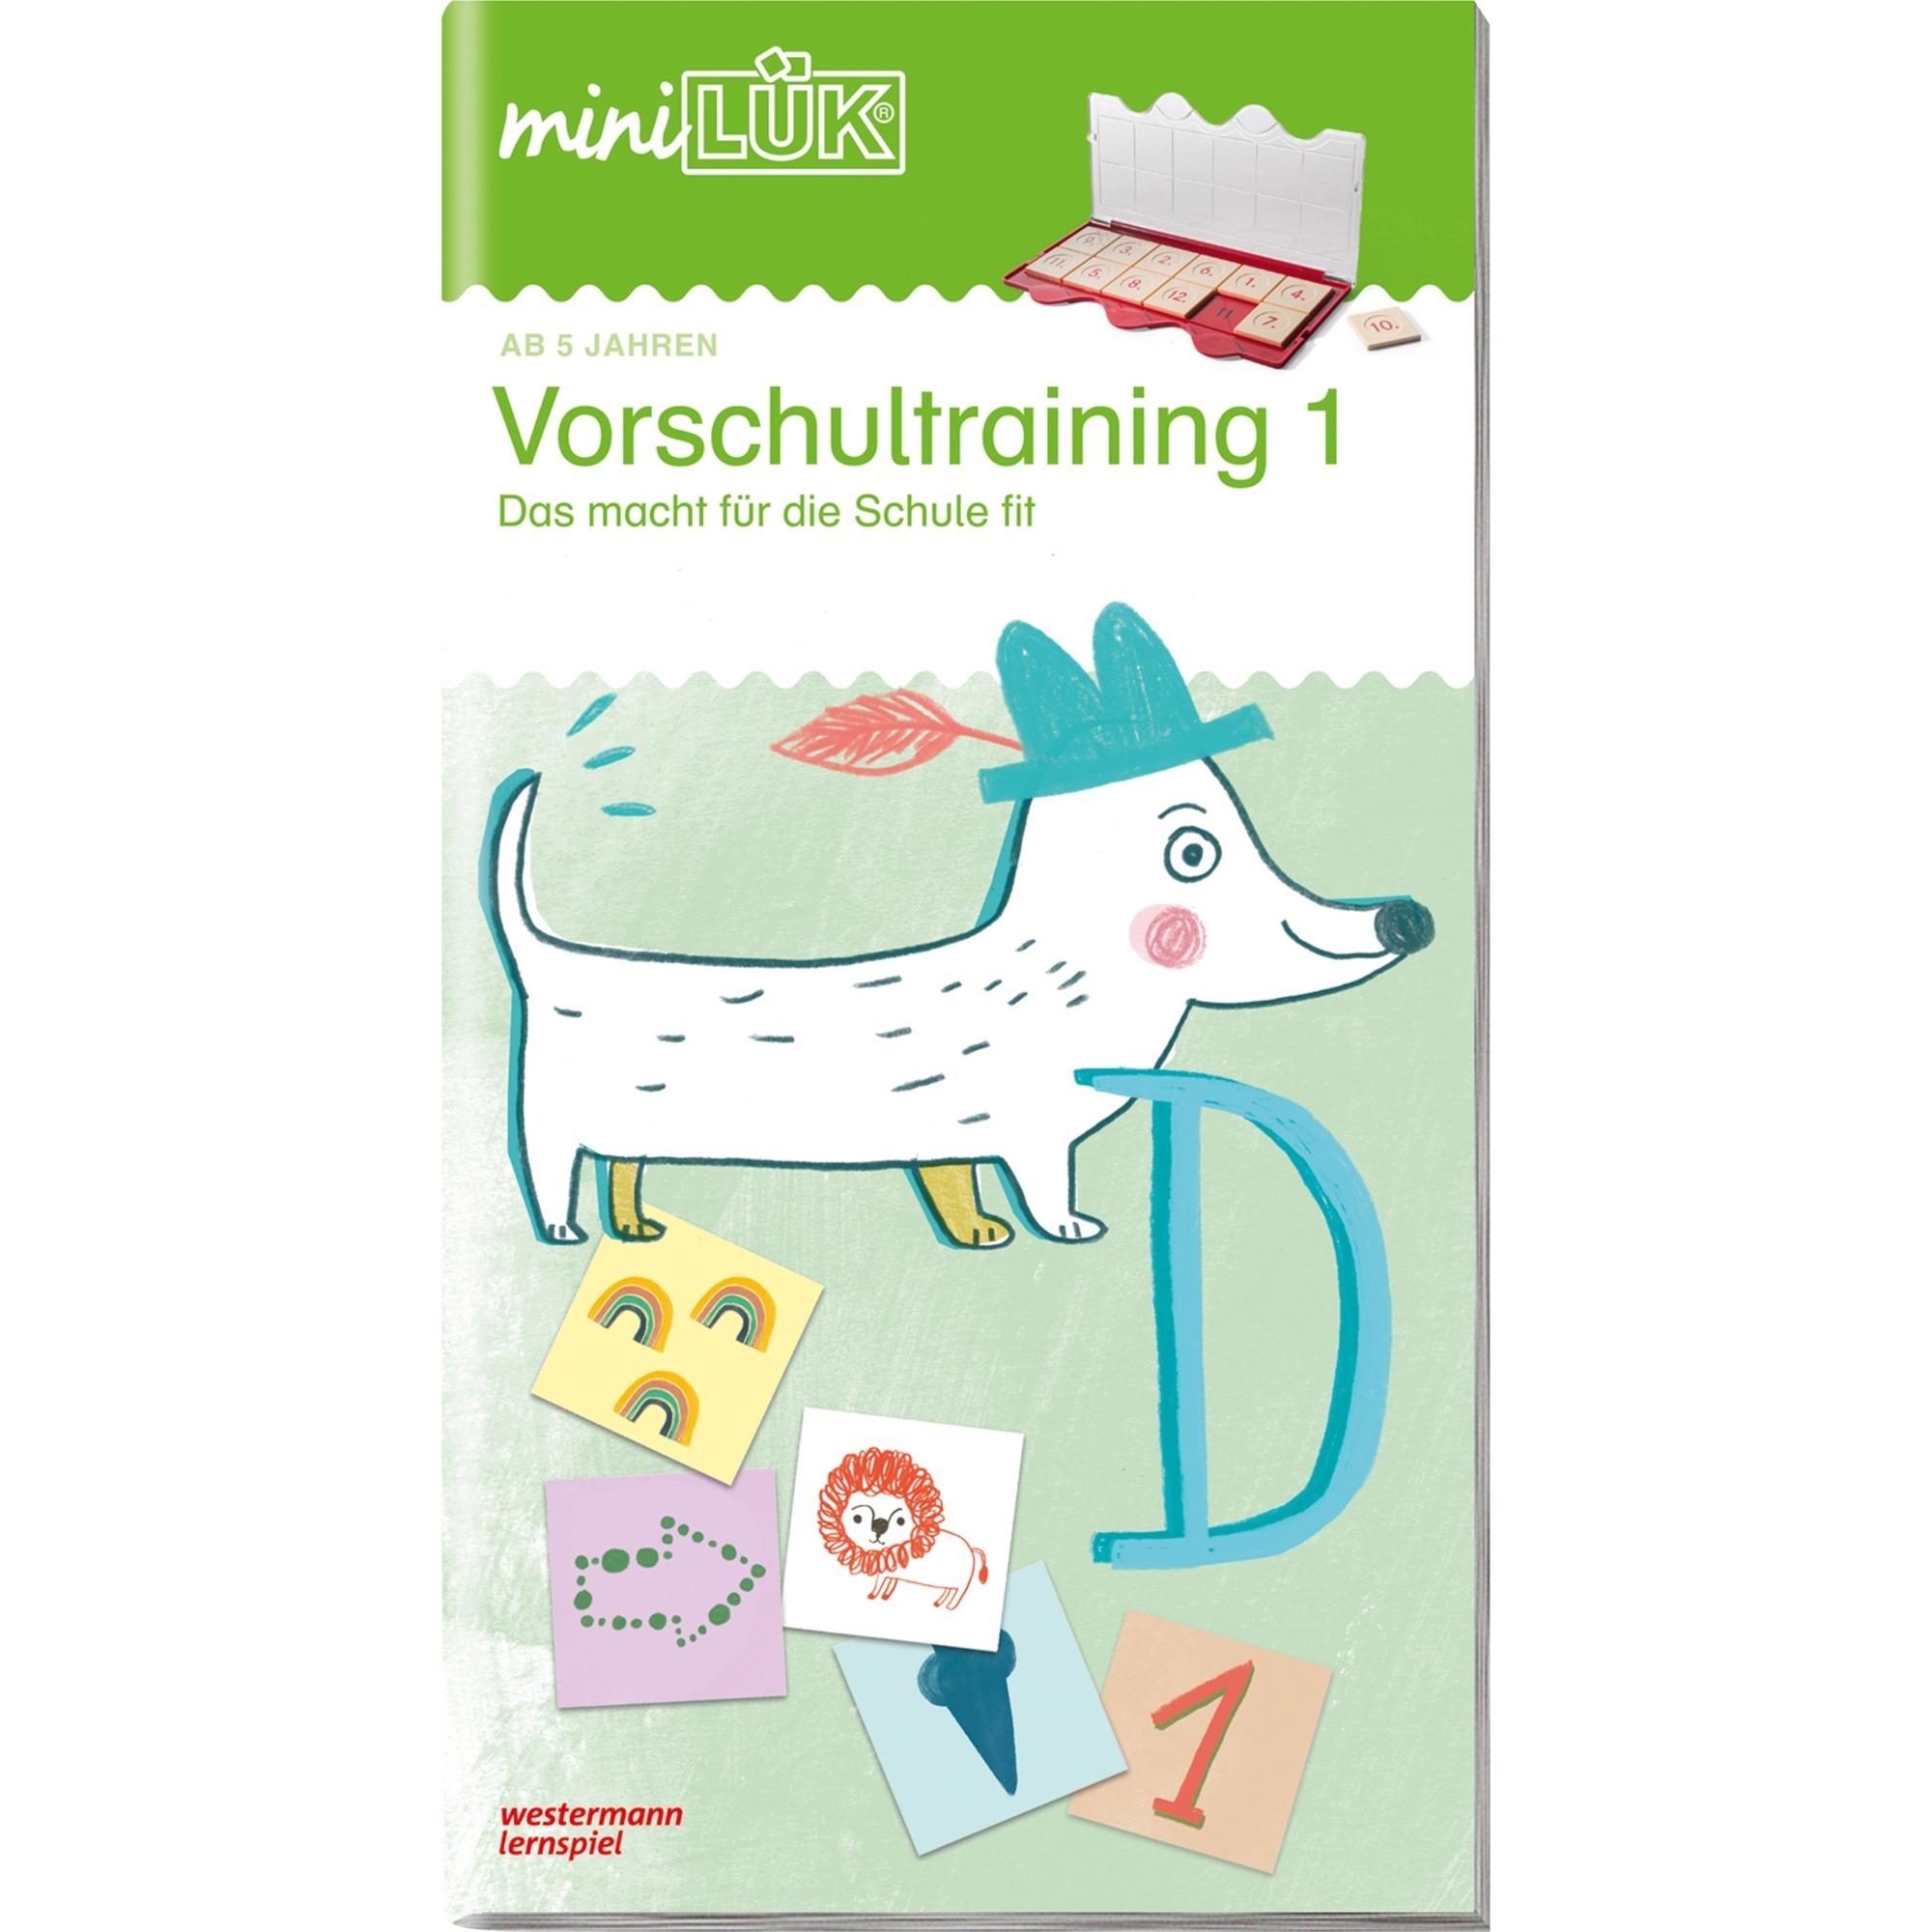 978-3-8377-0135-7 libro infantil, Libro tutorial